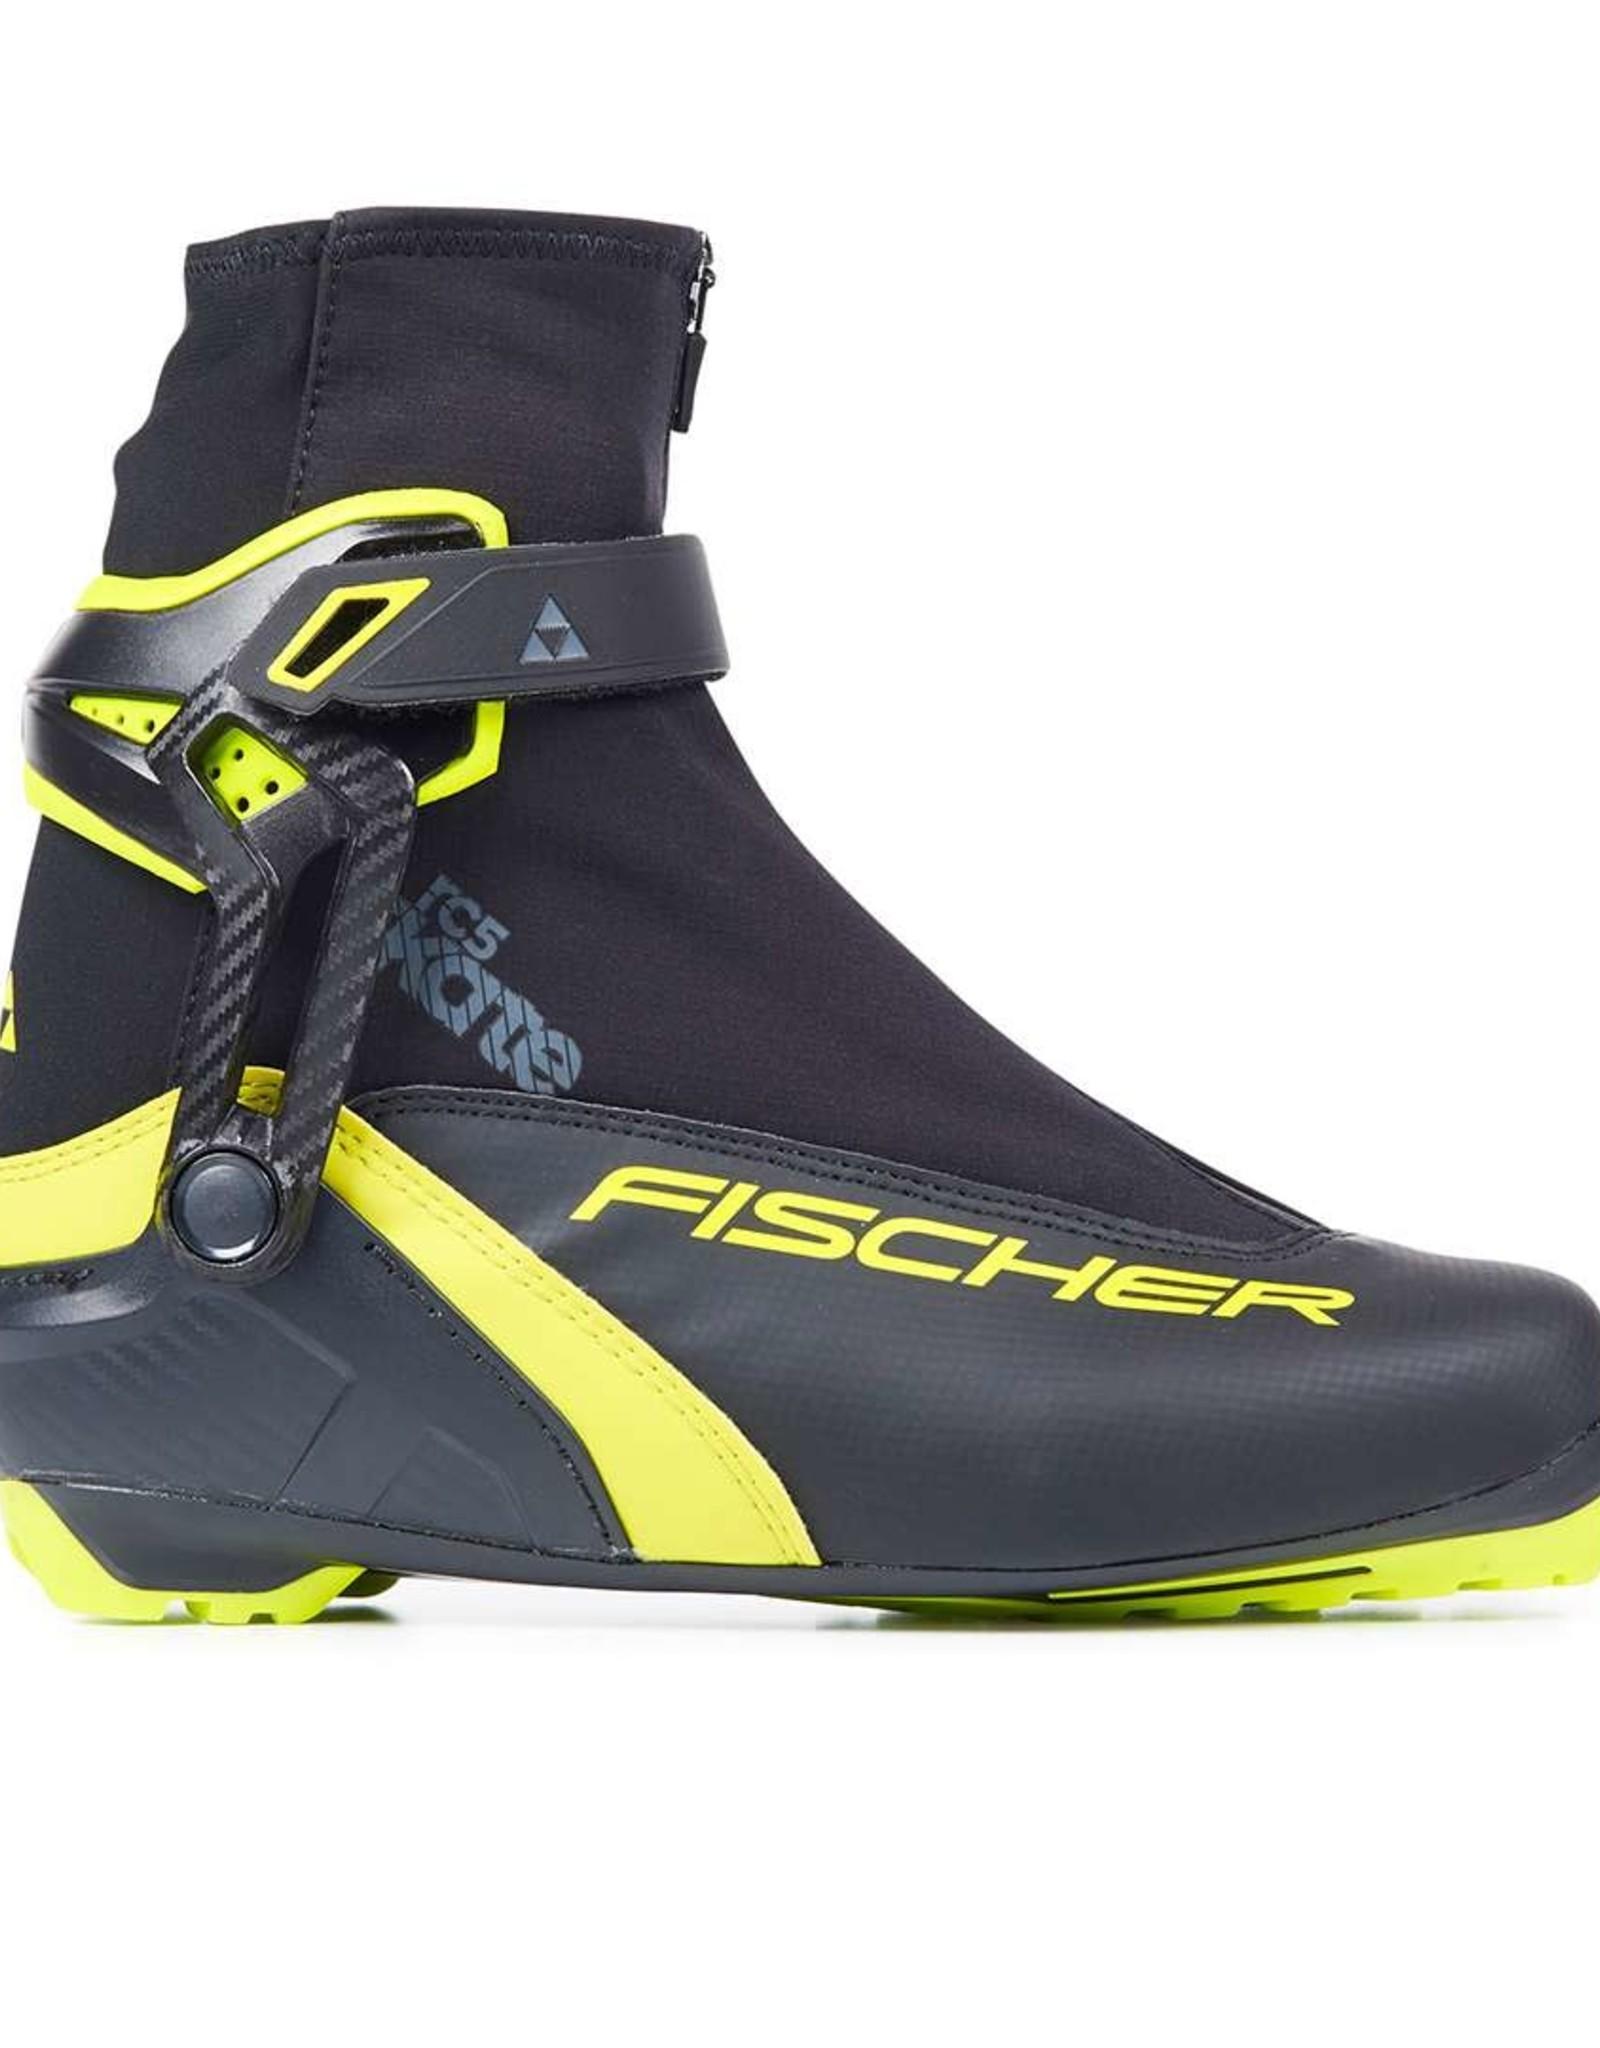 Fischer RC5 Skate Boot Turnamic